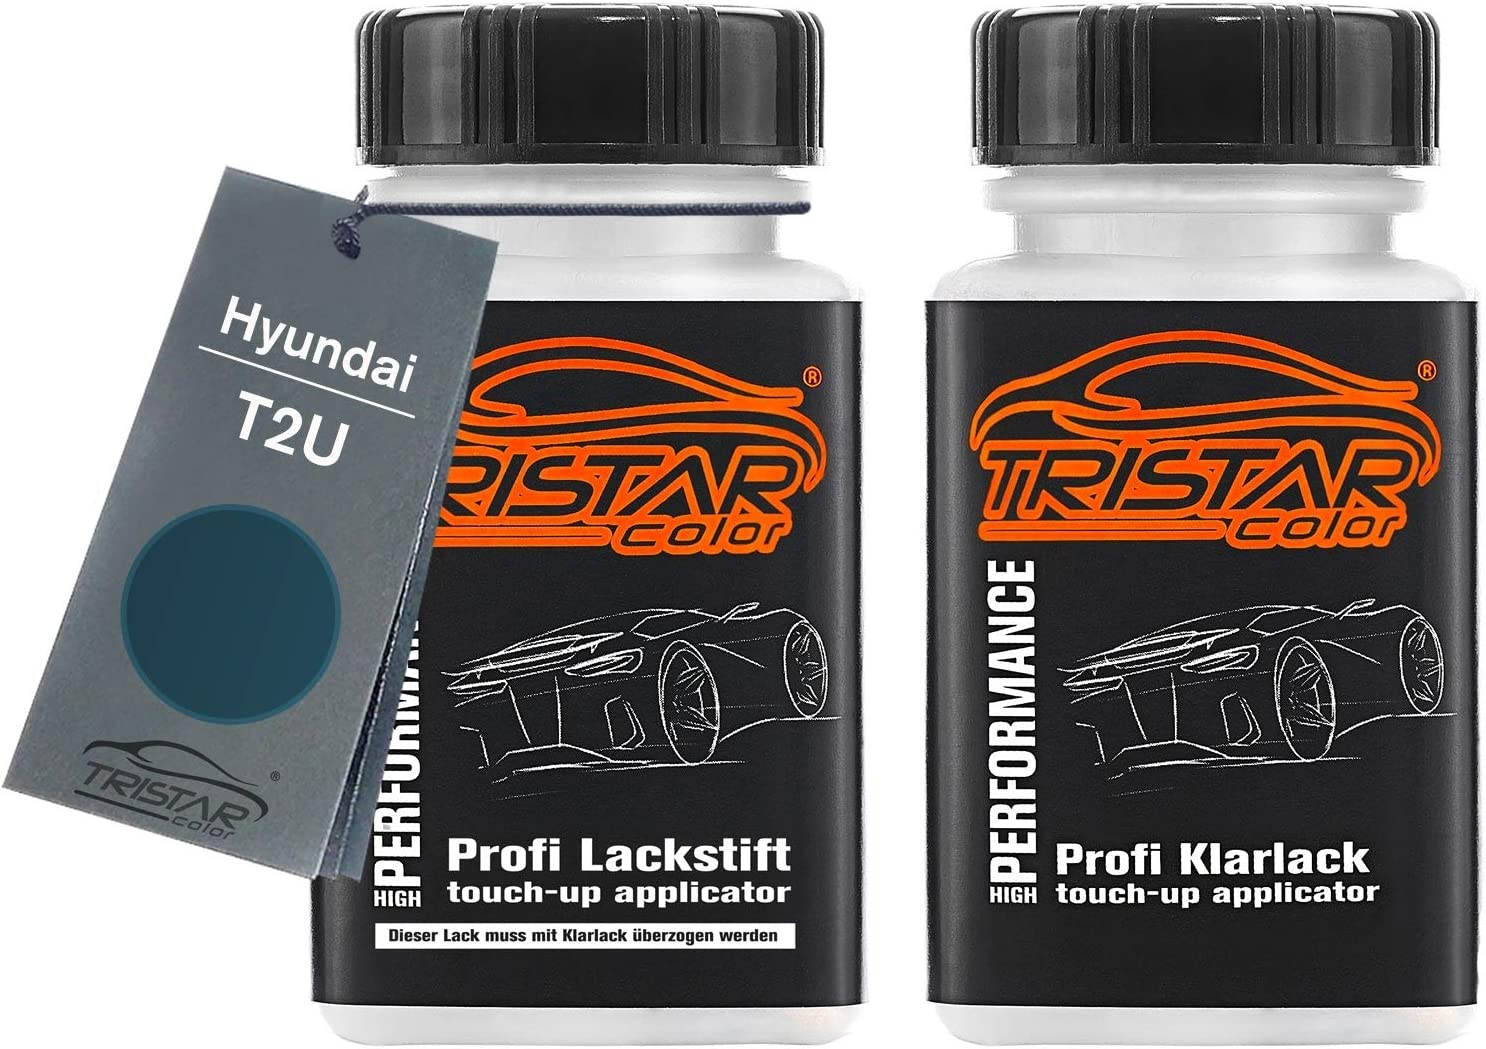 Tristarcolor Autolack Lackstift Set Für Hyundai T2u Aqua Blue Metallic Basislack Klarlack Je 50ml Auto